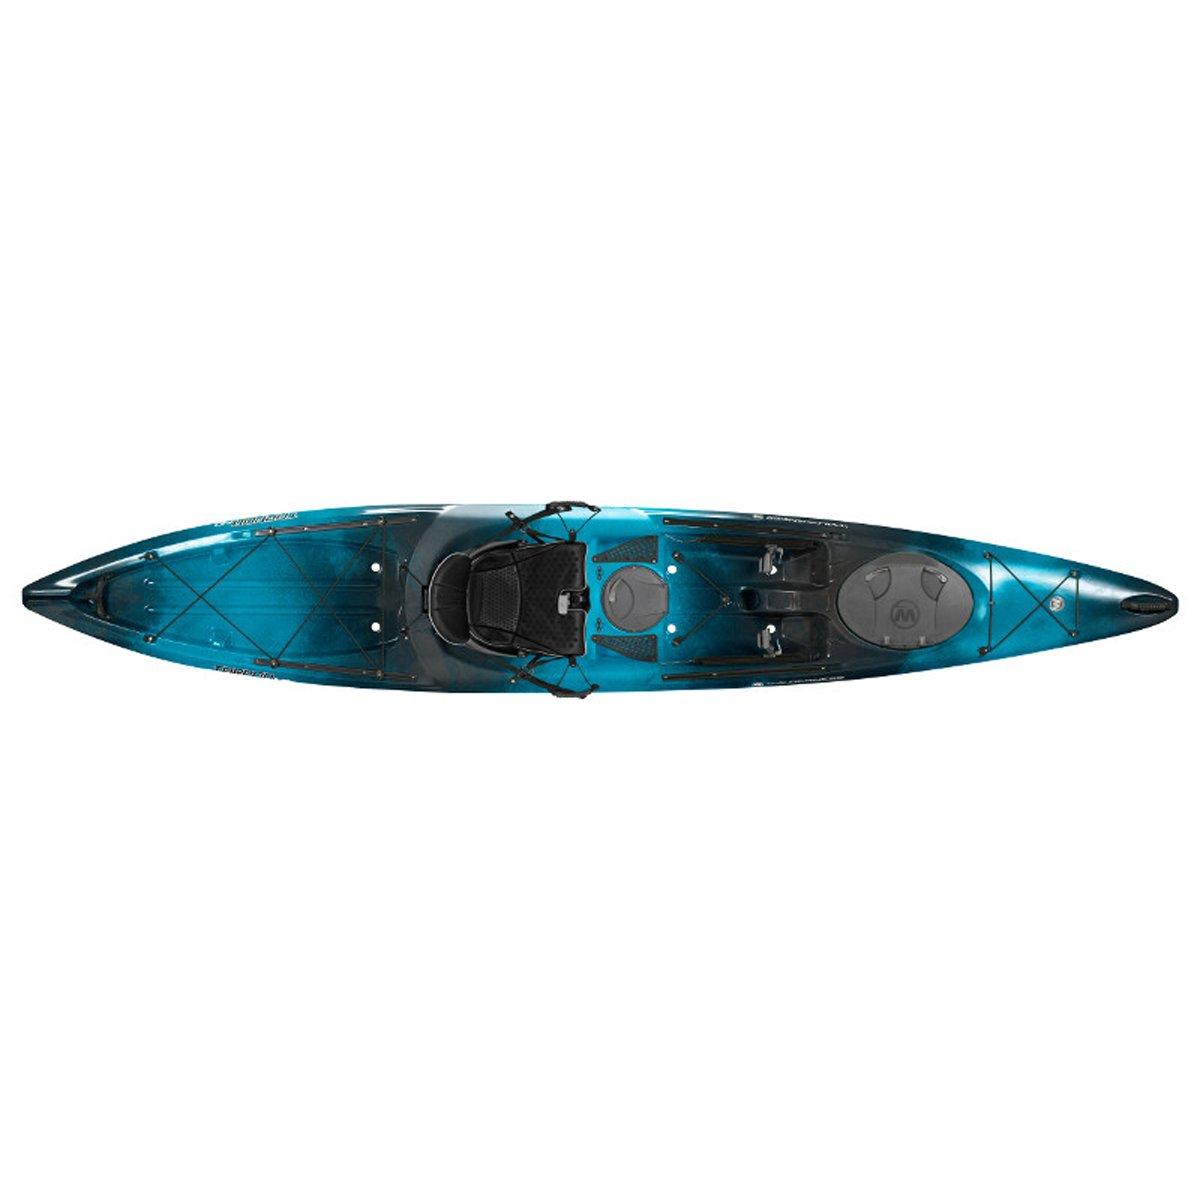 Wilderness Systems 9750405110 Tarpon 140 Kayaks, Midnight, 14' by Wilderness Systems